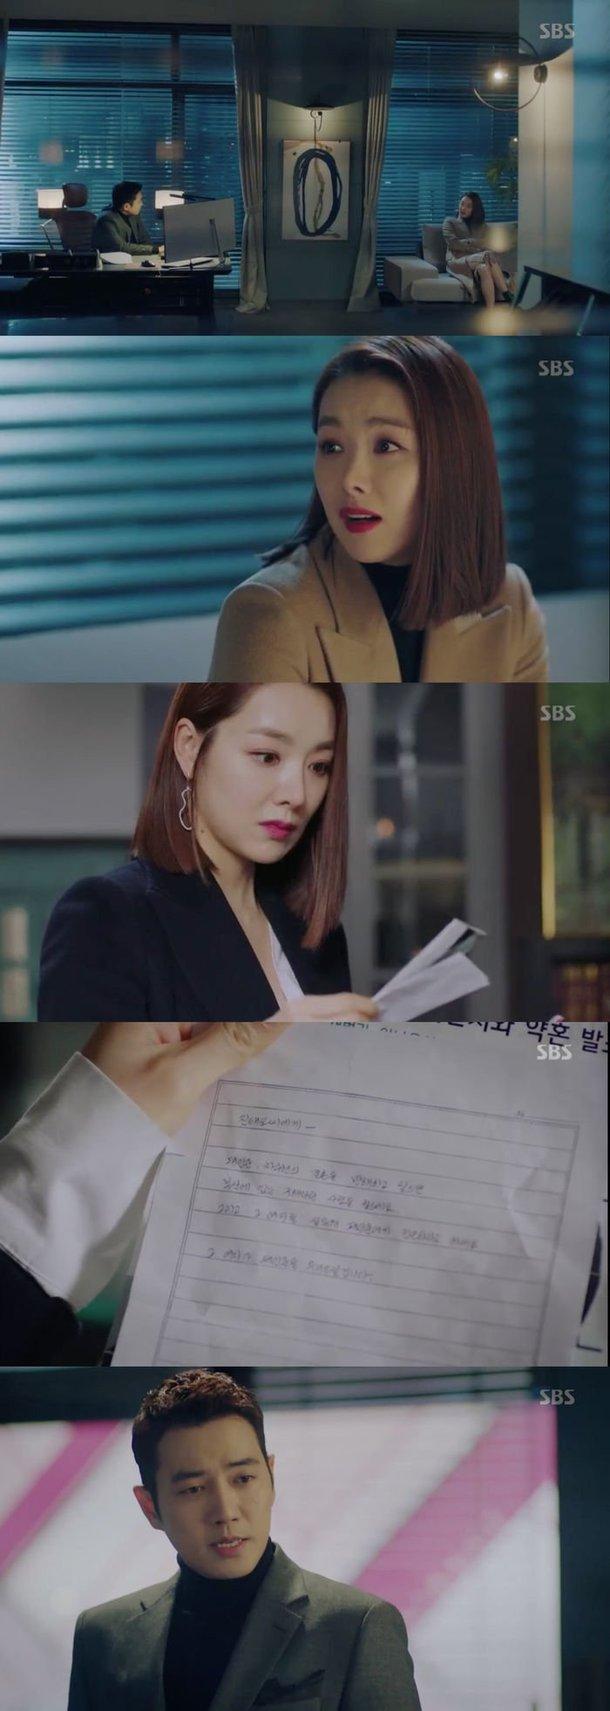 Spoiler Fates And Furies So Yi Hyun Lies To Joo Sang Wook